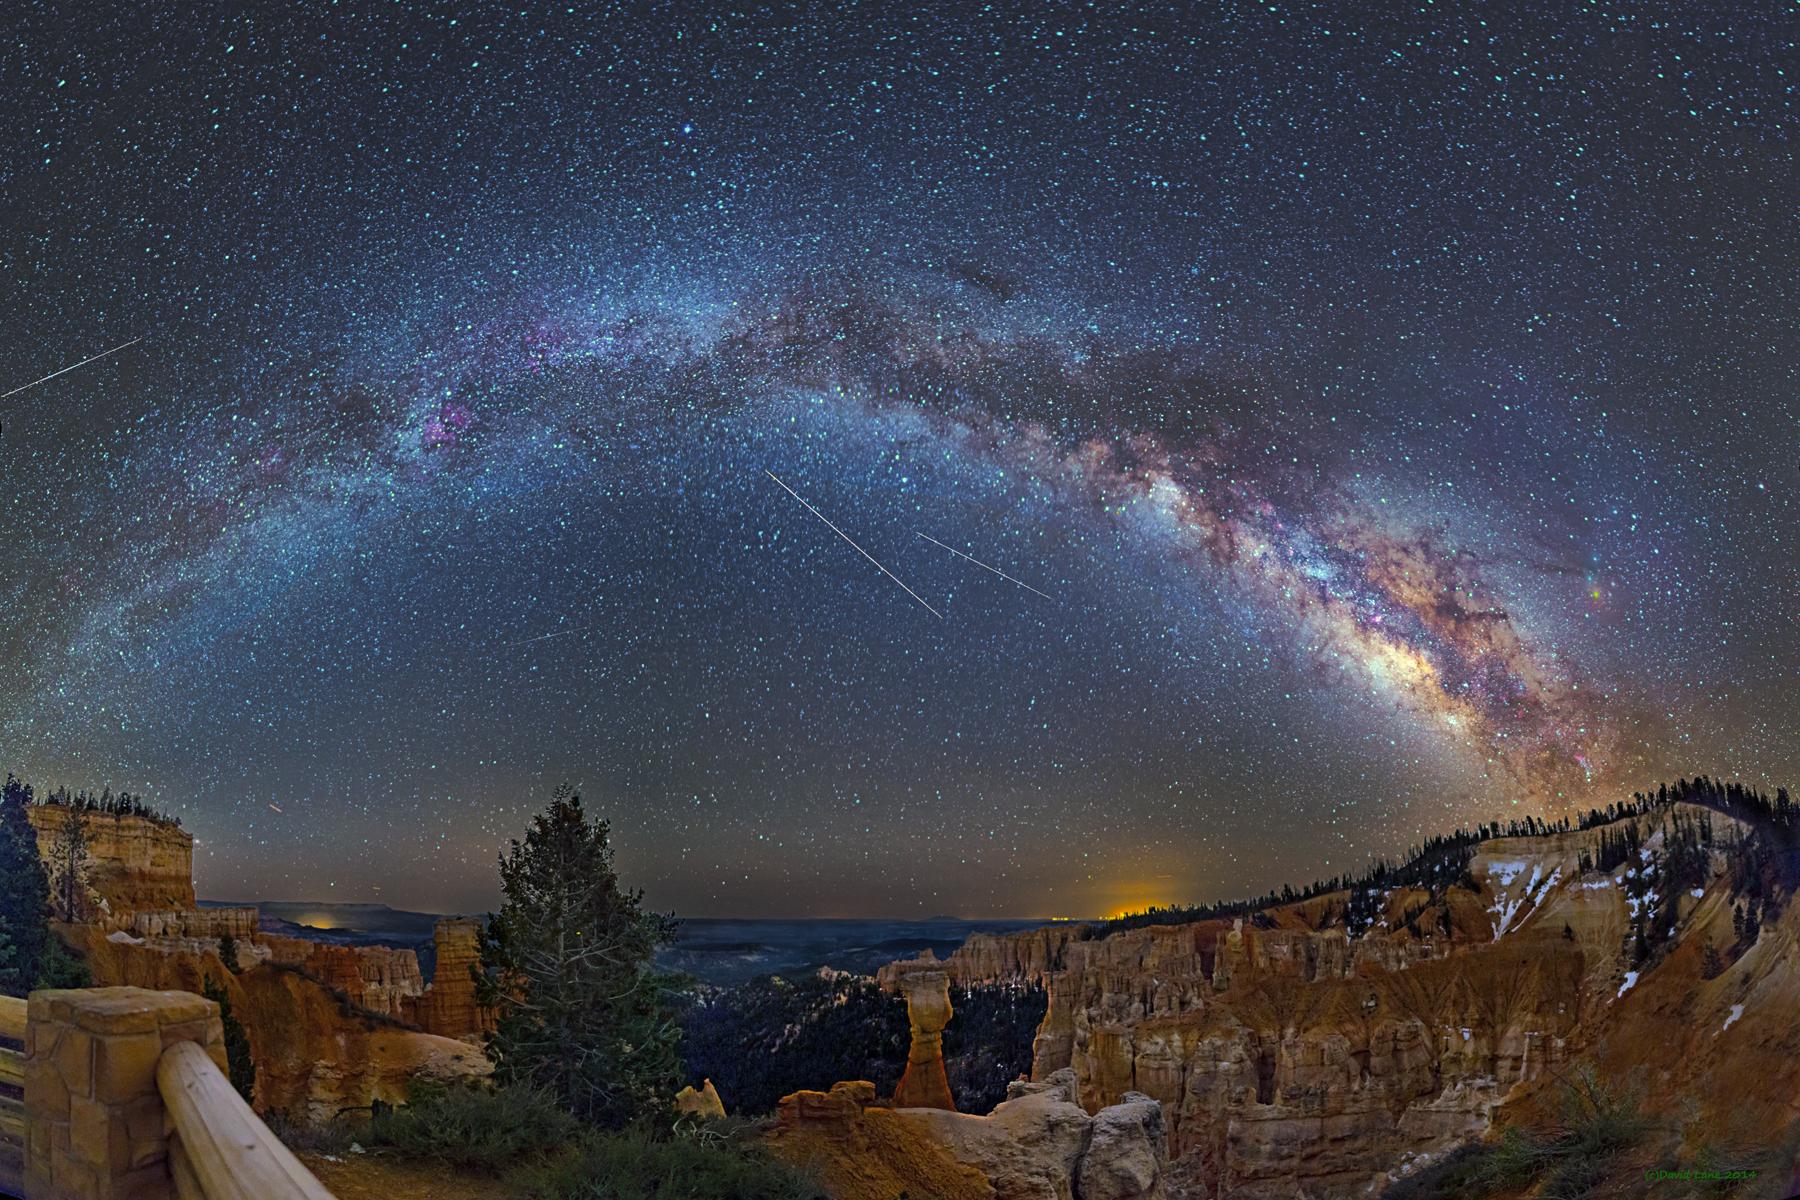 meteorsbryce_lane_1800.jpg